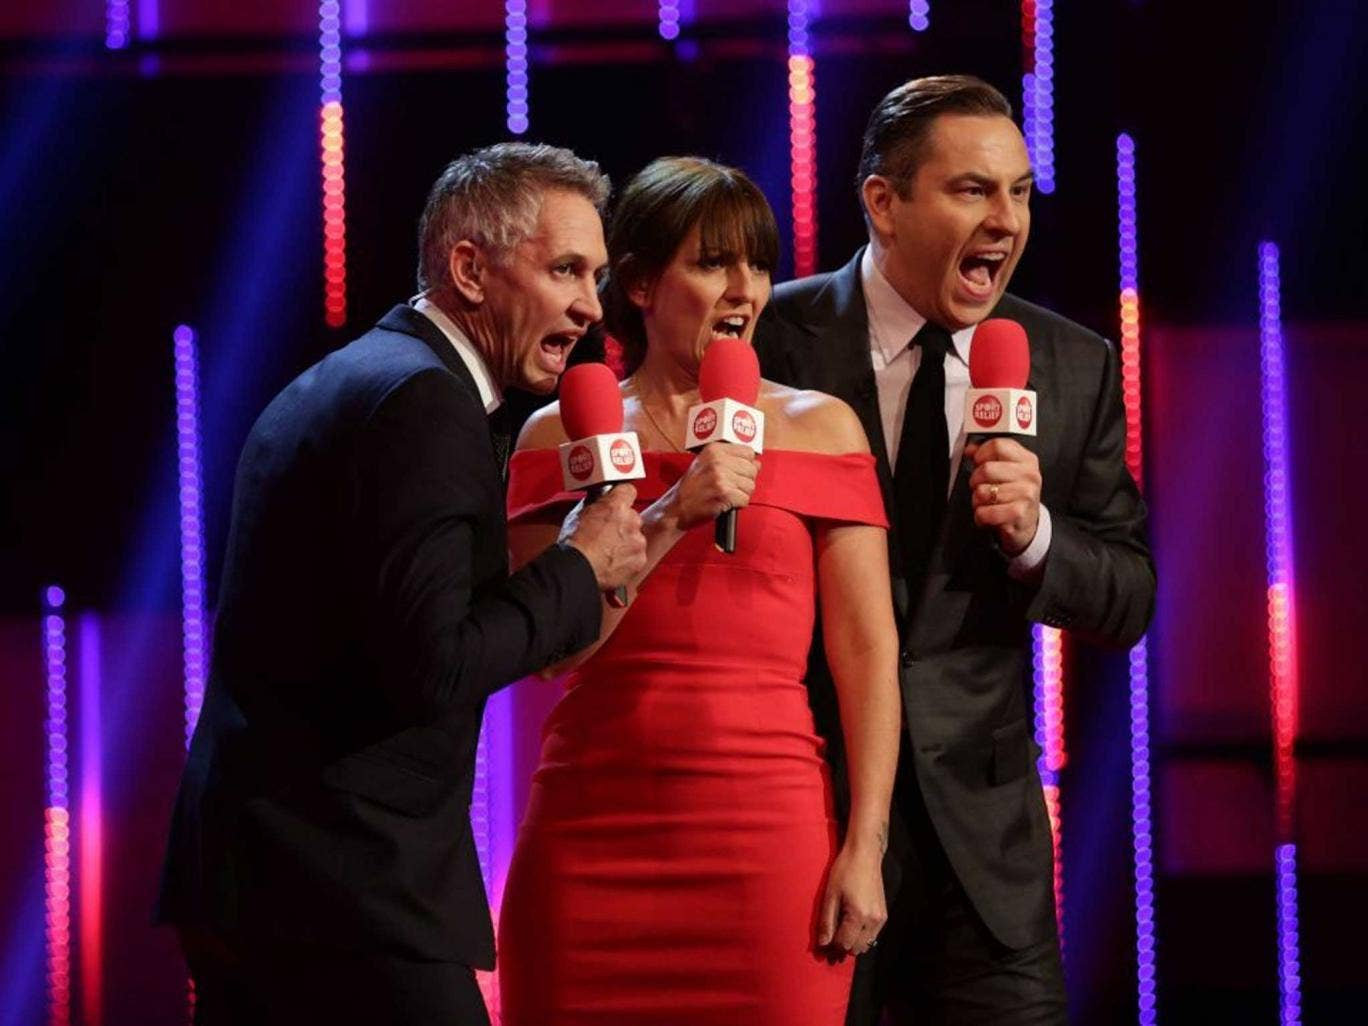 Loud Charity: Sport Relief's Gary Lineker, Davina McCall and David Walliams